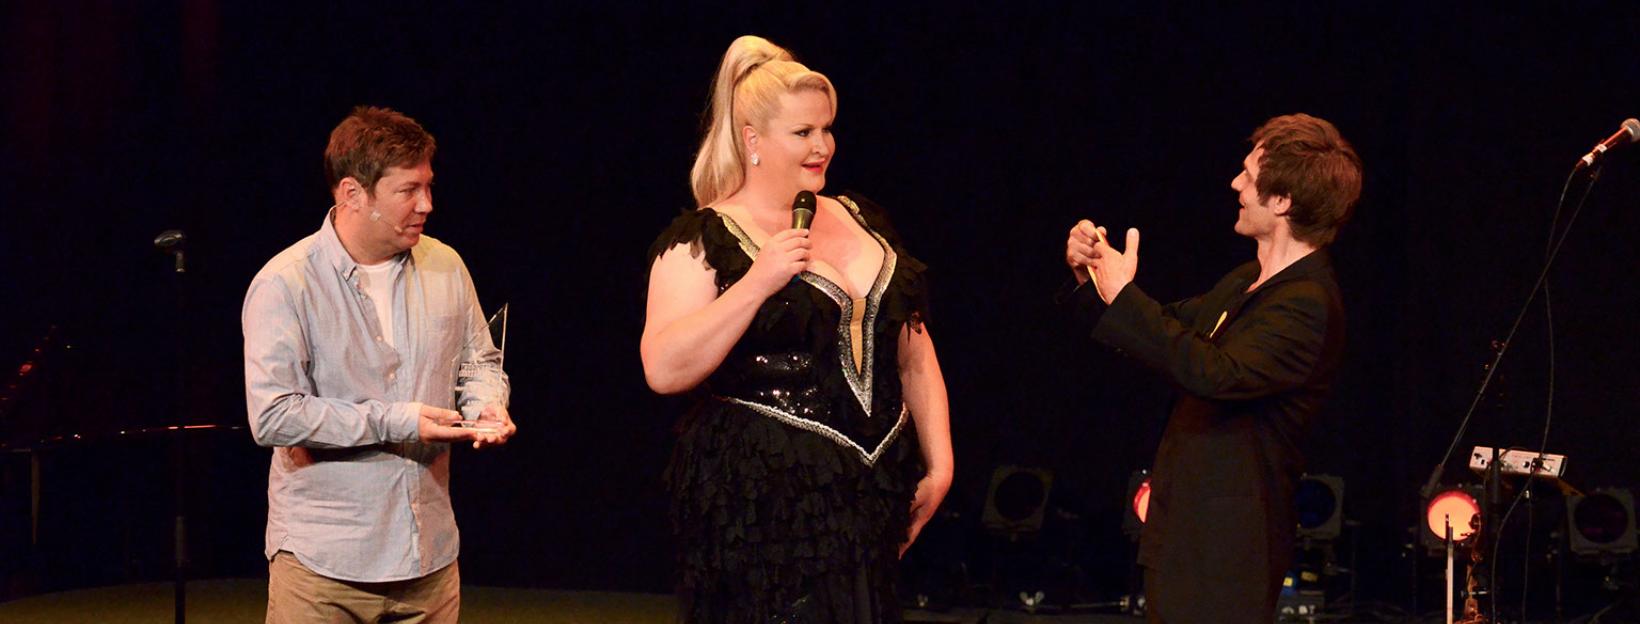 Kabarettbundesliga Daphne de Luxe, Sascha Korf